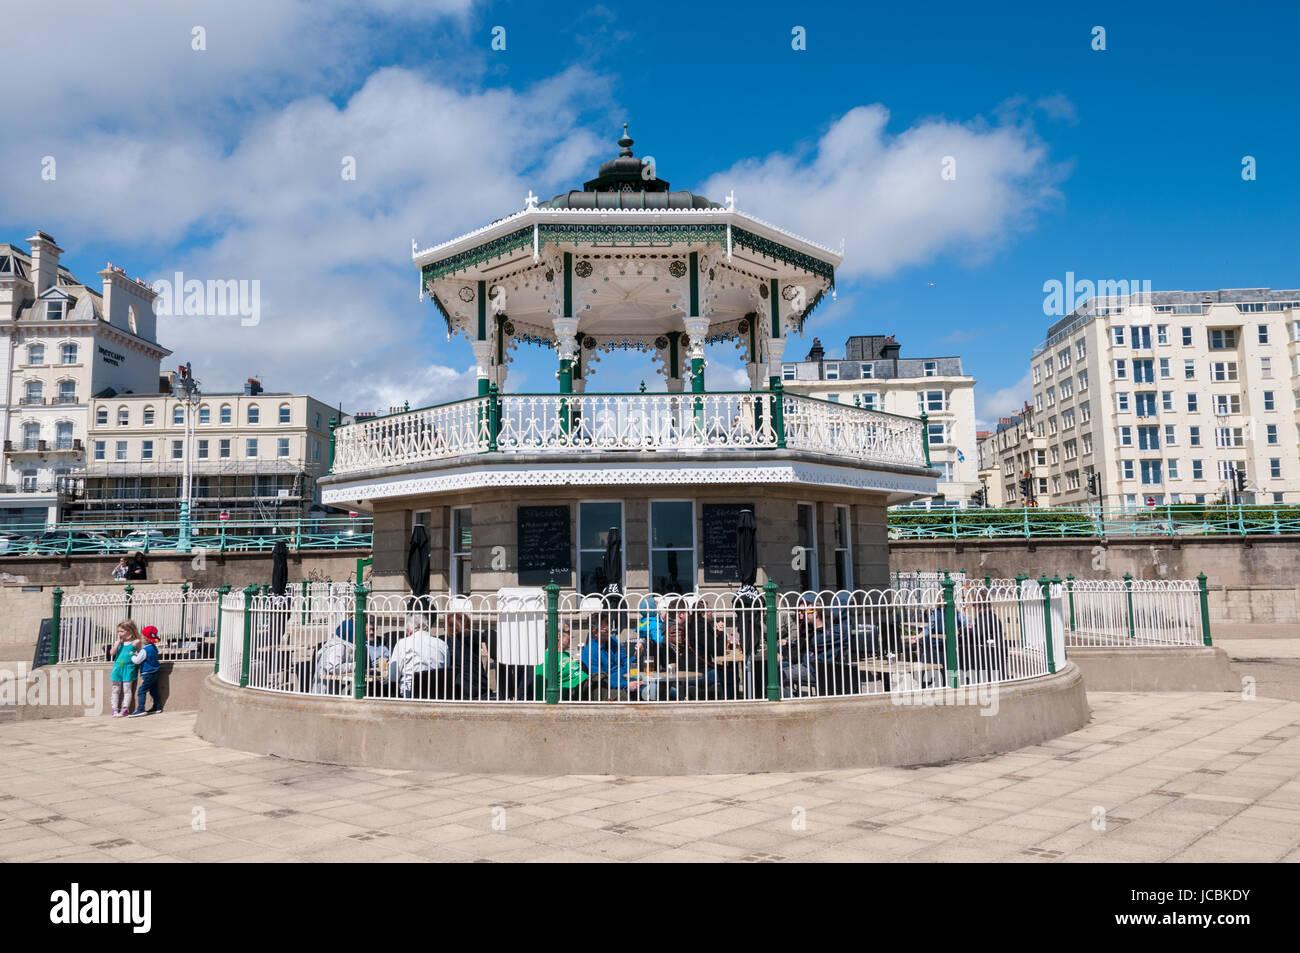 El Quiosco, Brighton Seafront, Reino Unido Foto de stock